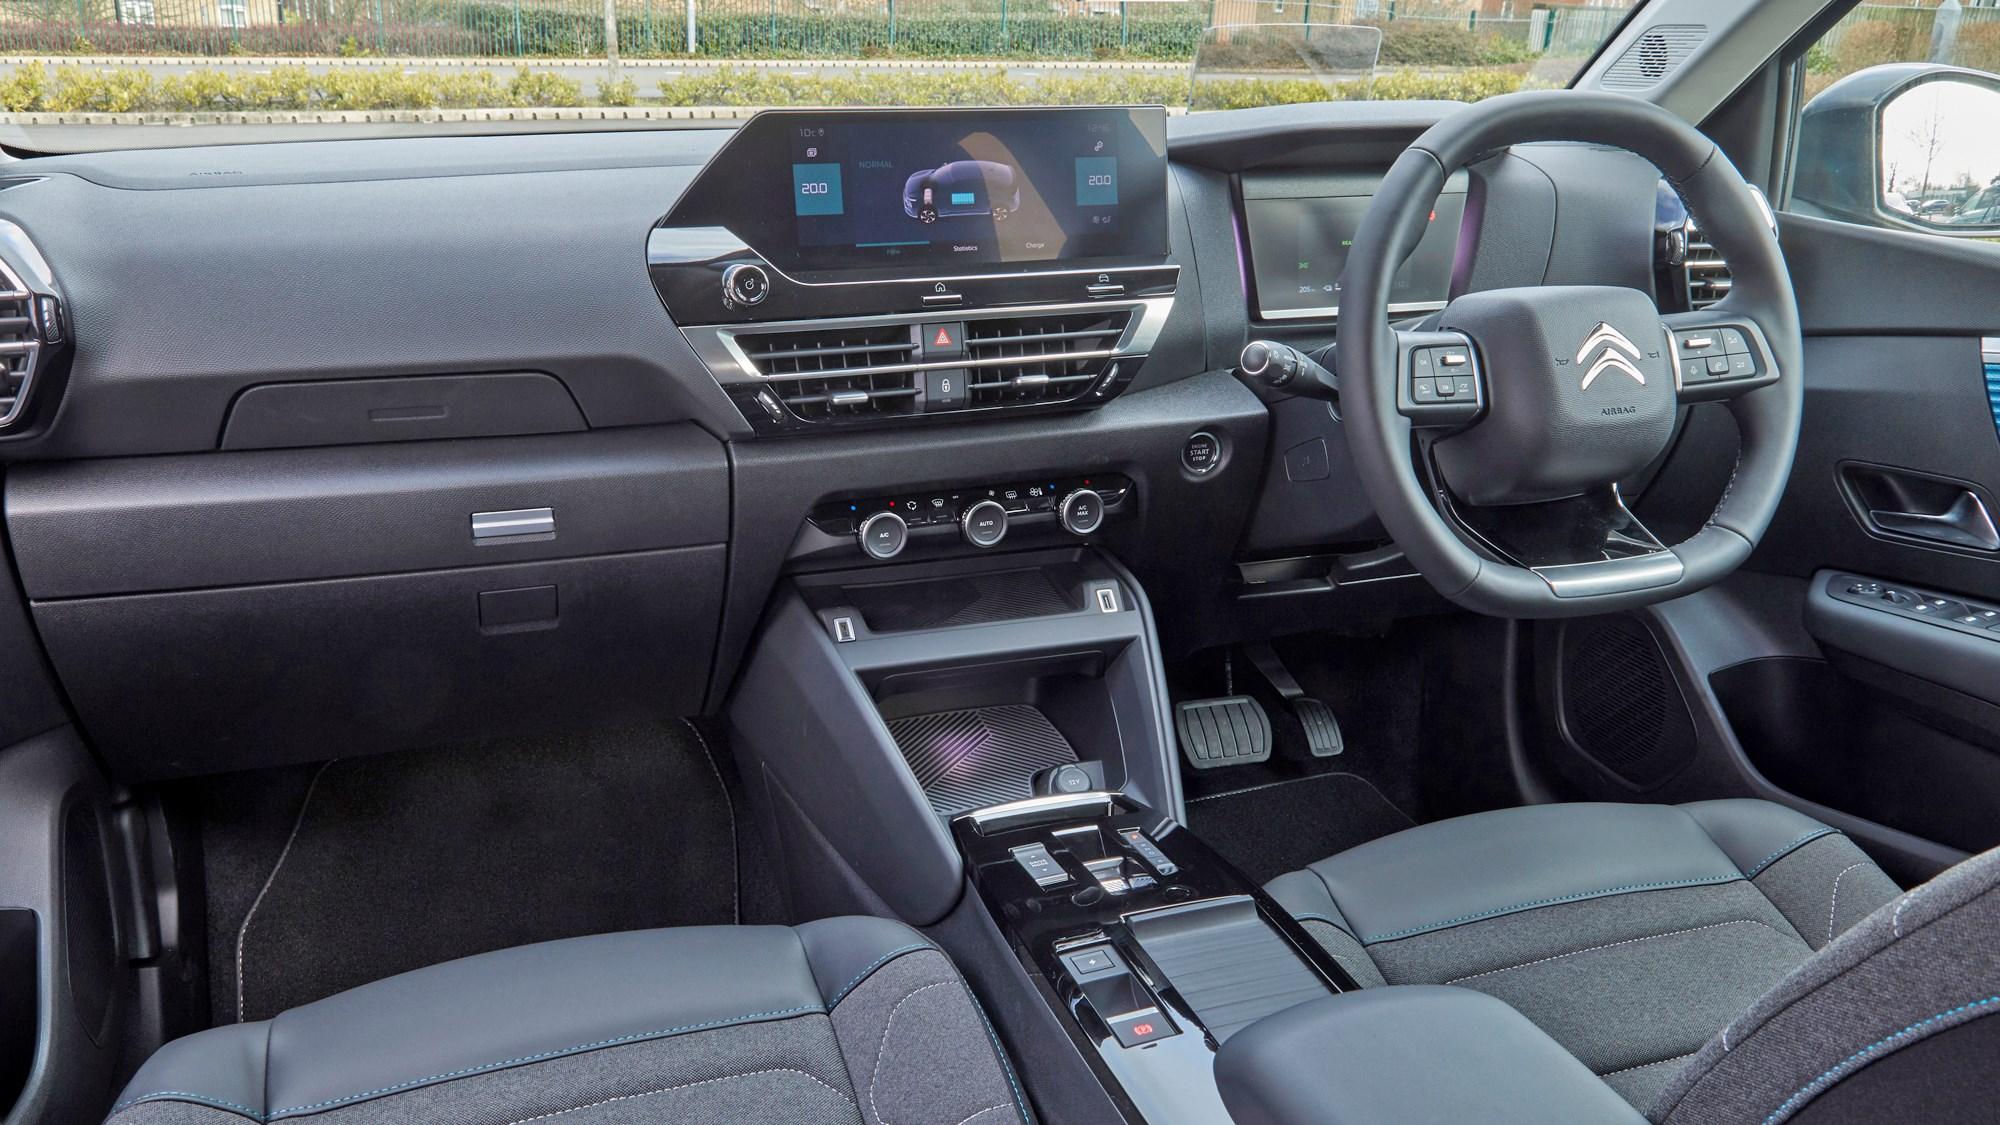 Grey 2021 Citroen e-C4 dashboard